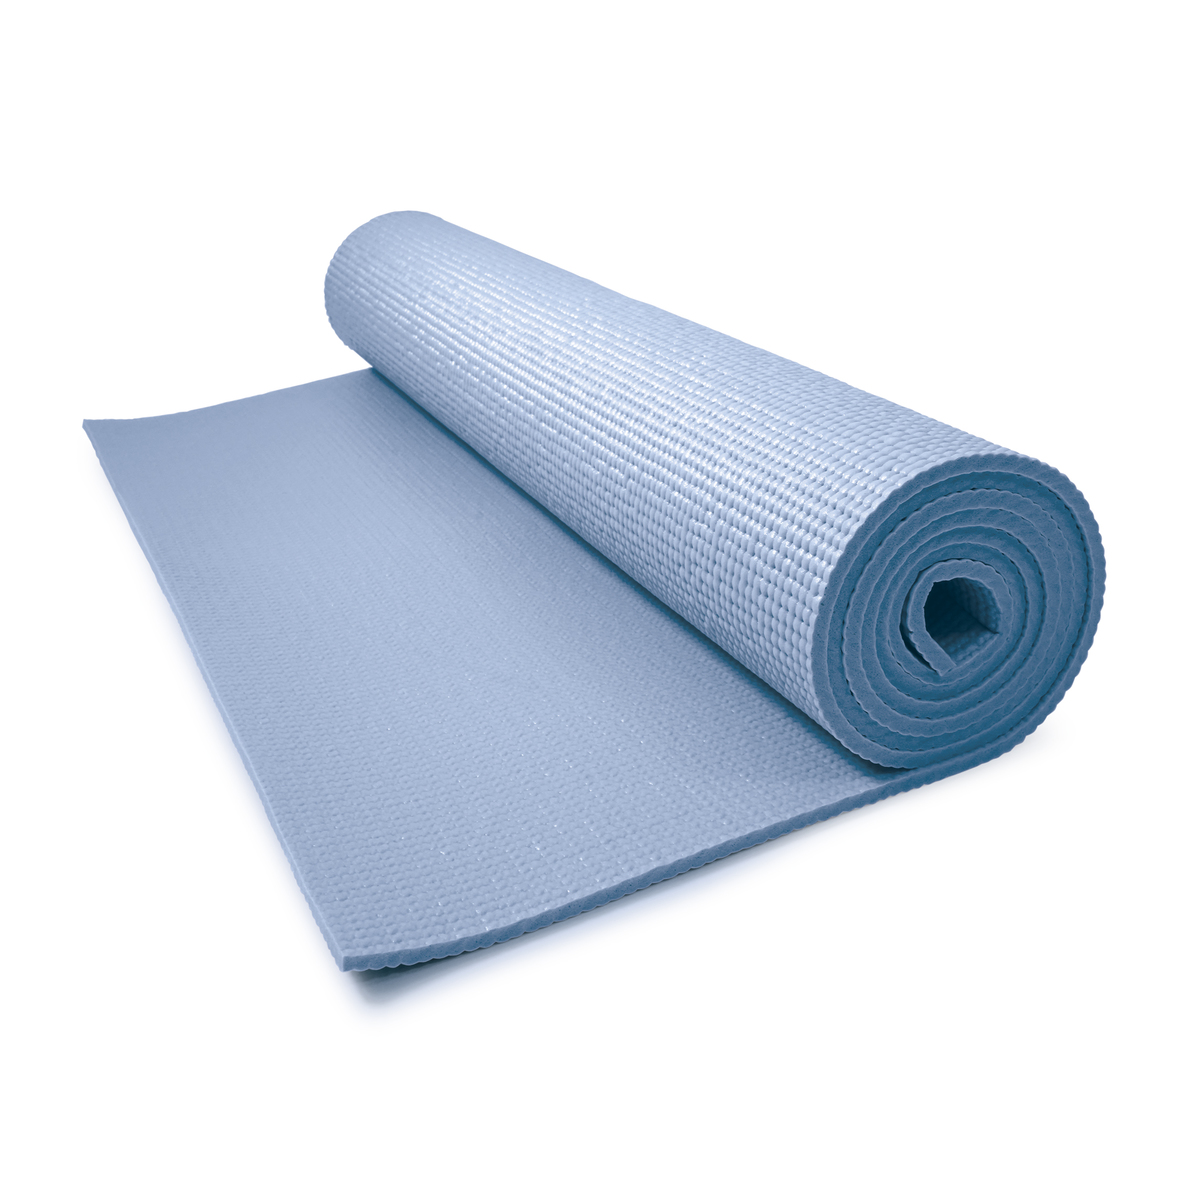 yoga mat (blue) - YM2468BL